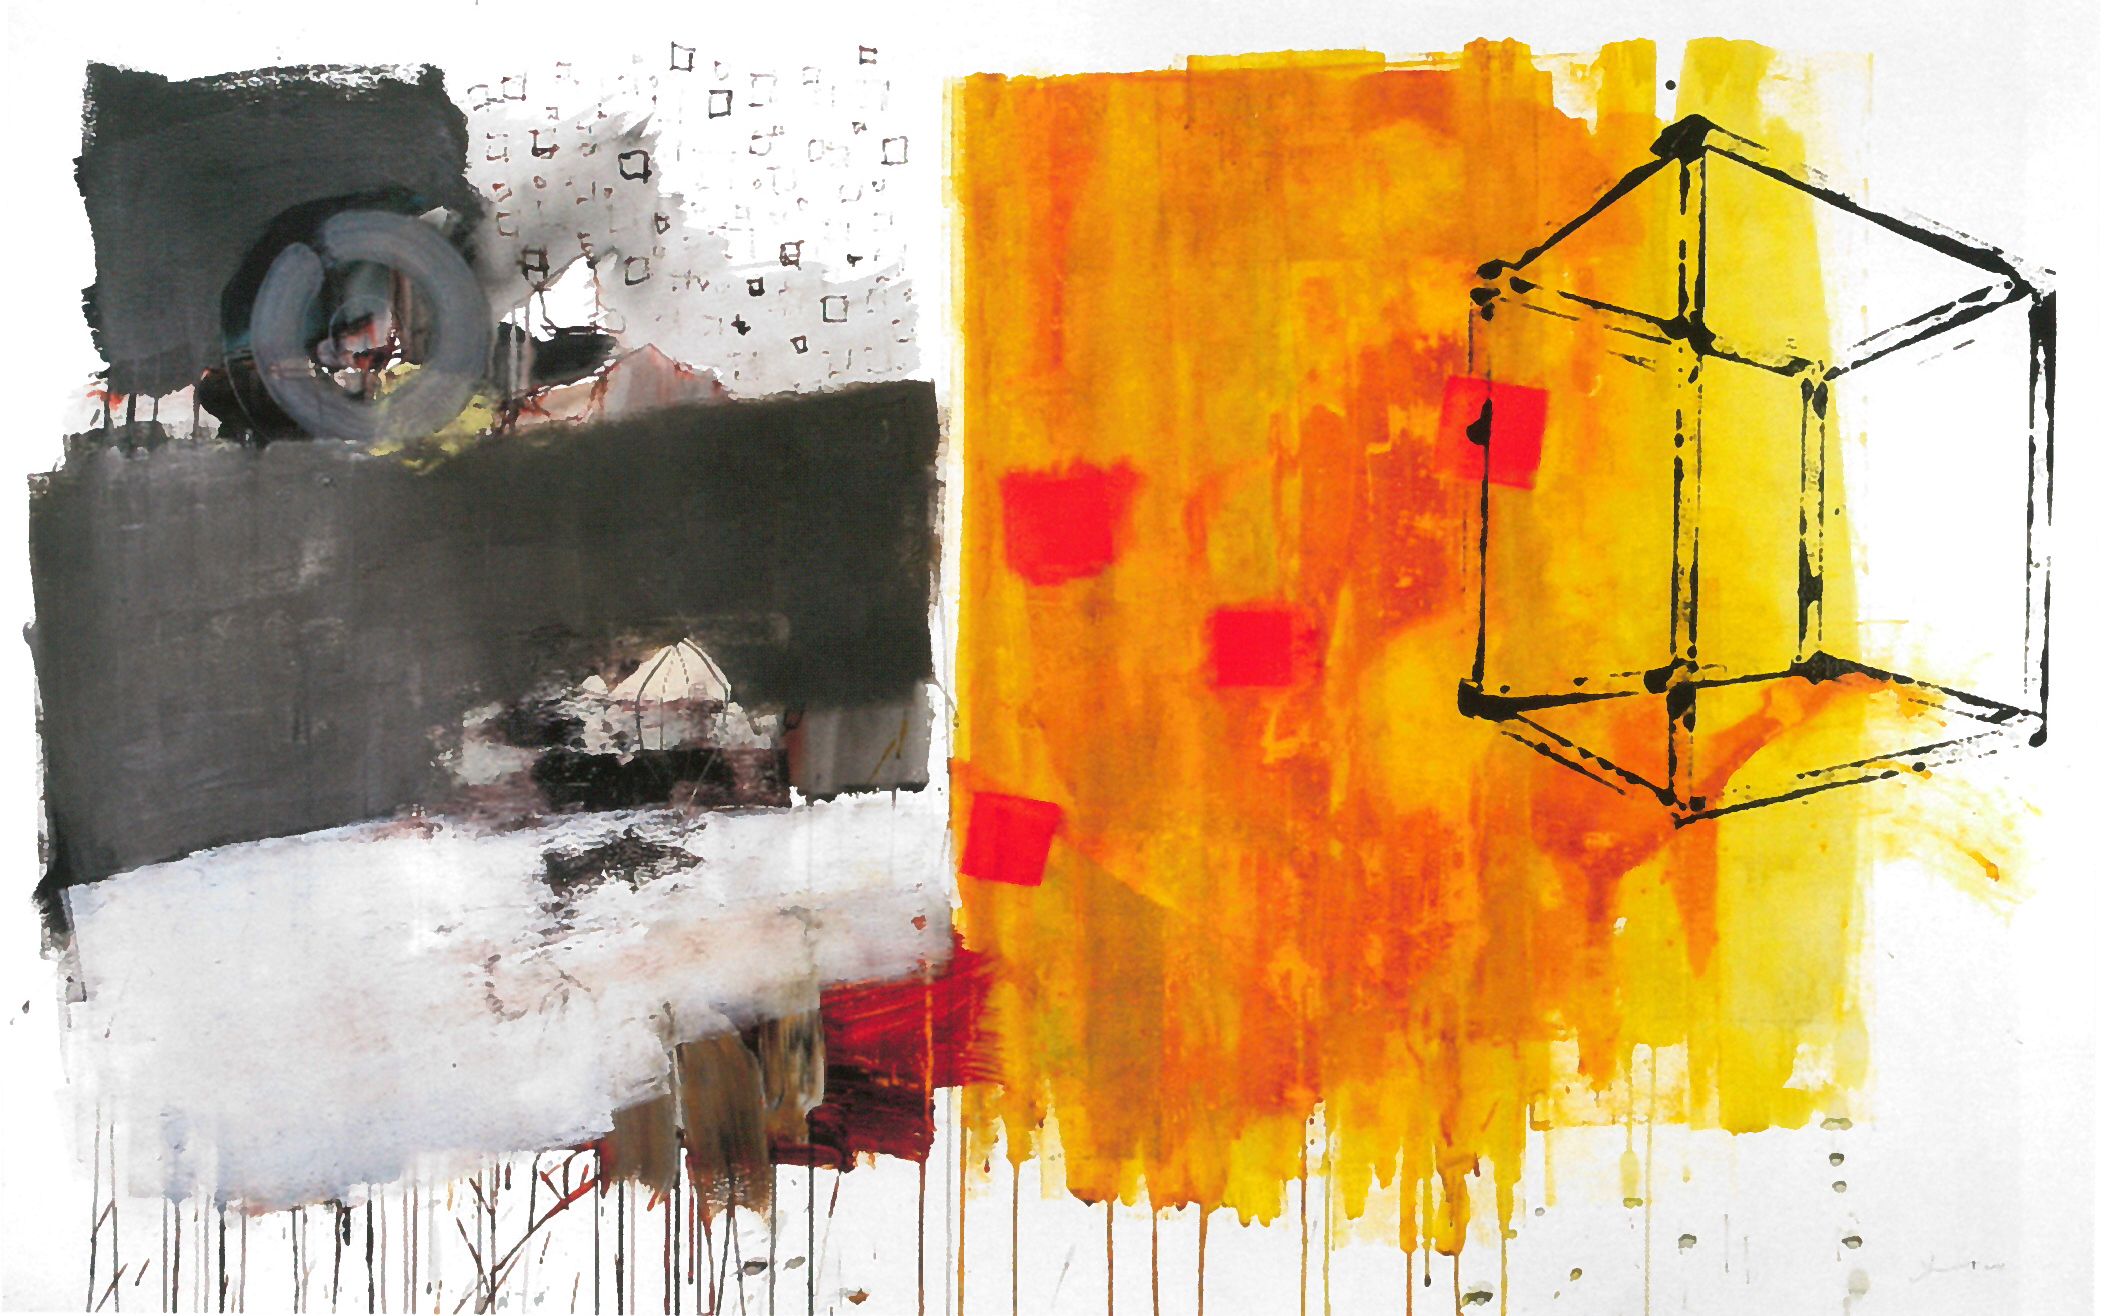 Jason+Bennett_Gasworks+Park_2004_acrylic+on+paper_42%22+X+66%22.jpg